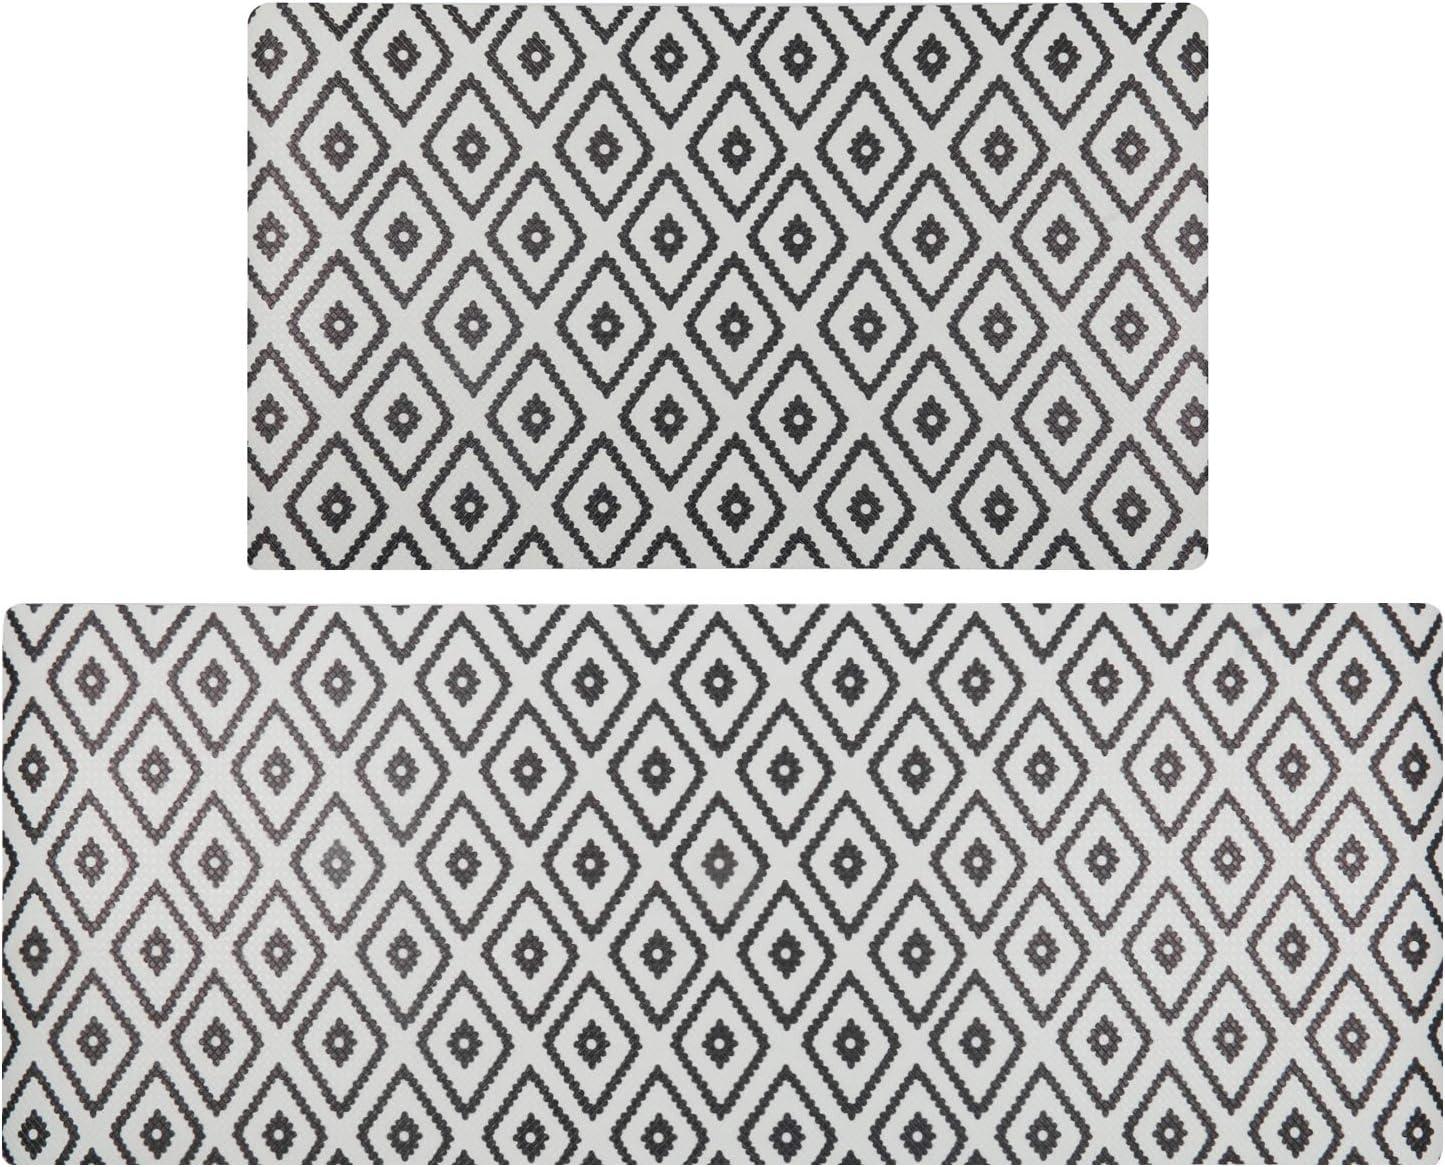 SHACOS Anti Fatigue Kitchen Floor Mat Set of 2 Comfort Mat PVC Foam Cushioned Standing Mats Kitchen Rug Waterproof Non Slip Wipe Clean (Black Rhombus, 18x30+18x47 Inches)